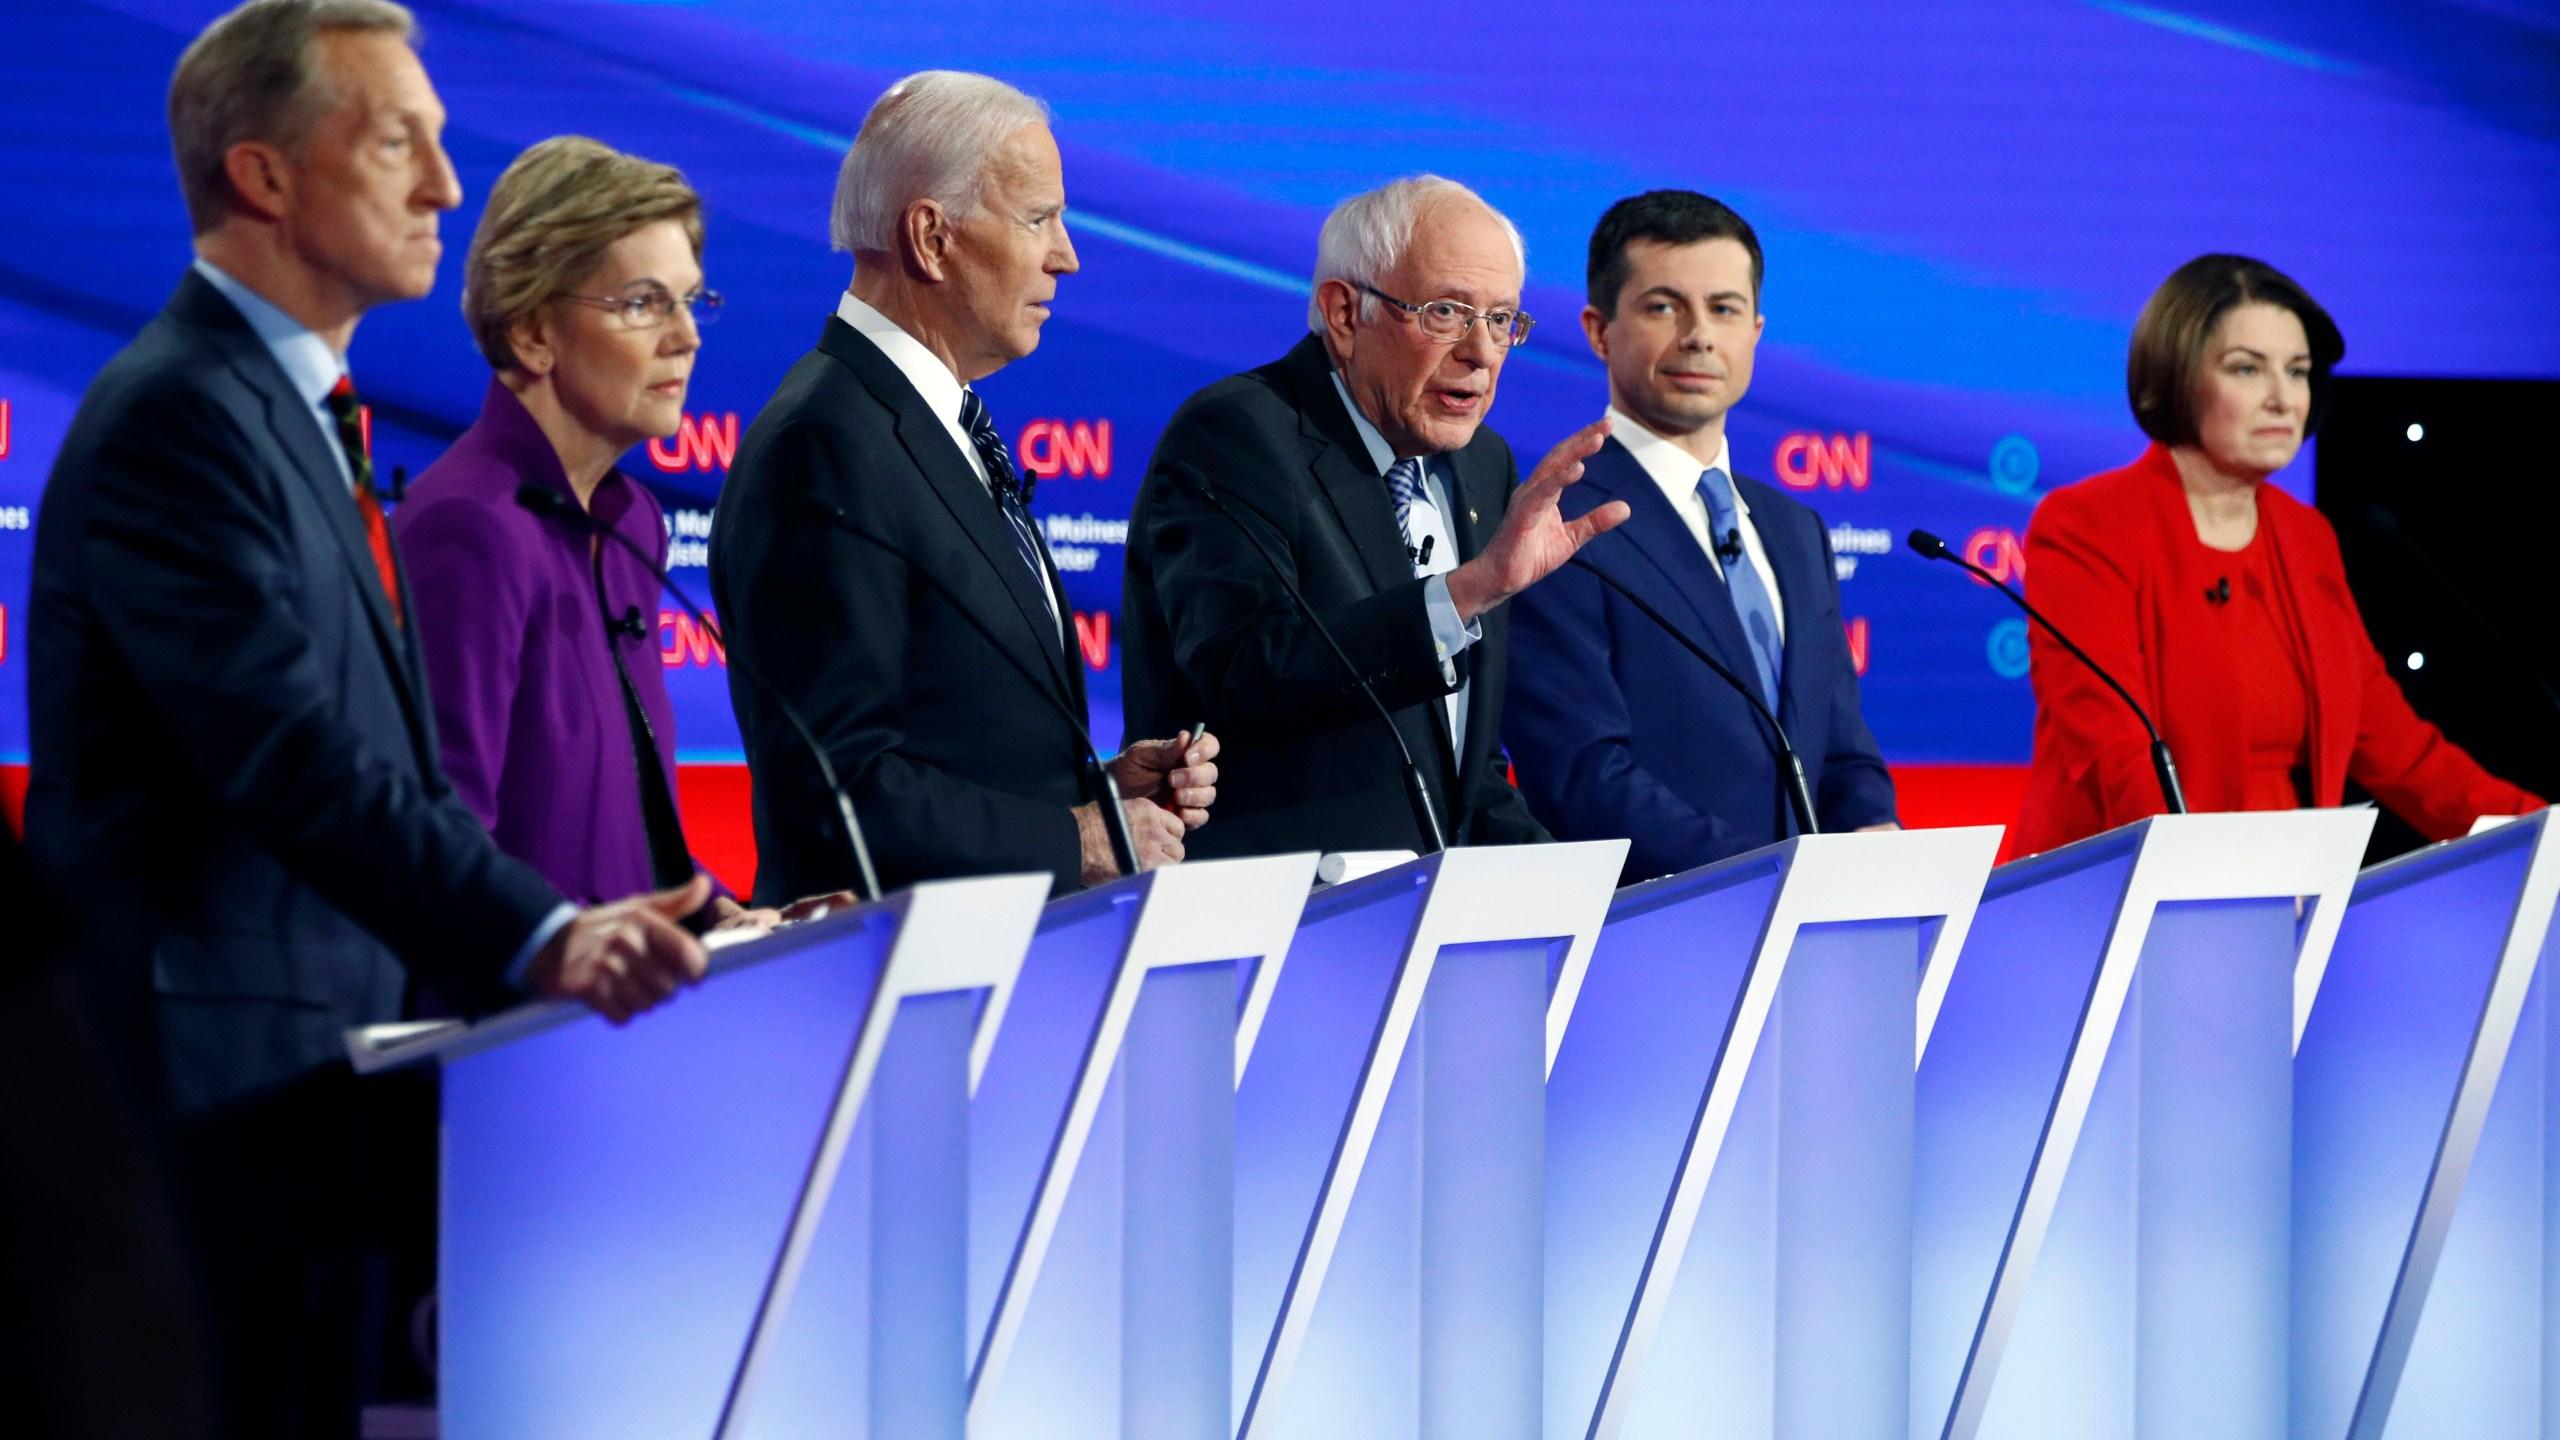 Amy Klobuchar, Pete Buttigieg, Bernie Sanders, Joe Biden, Elizabeth Warren, Tom Steyer